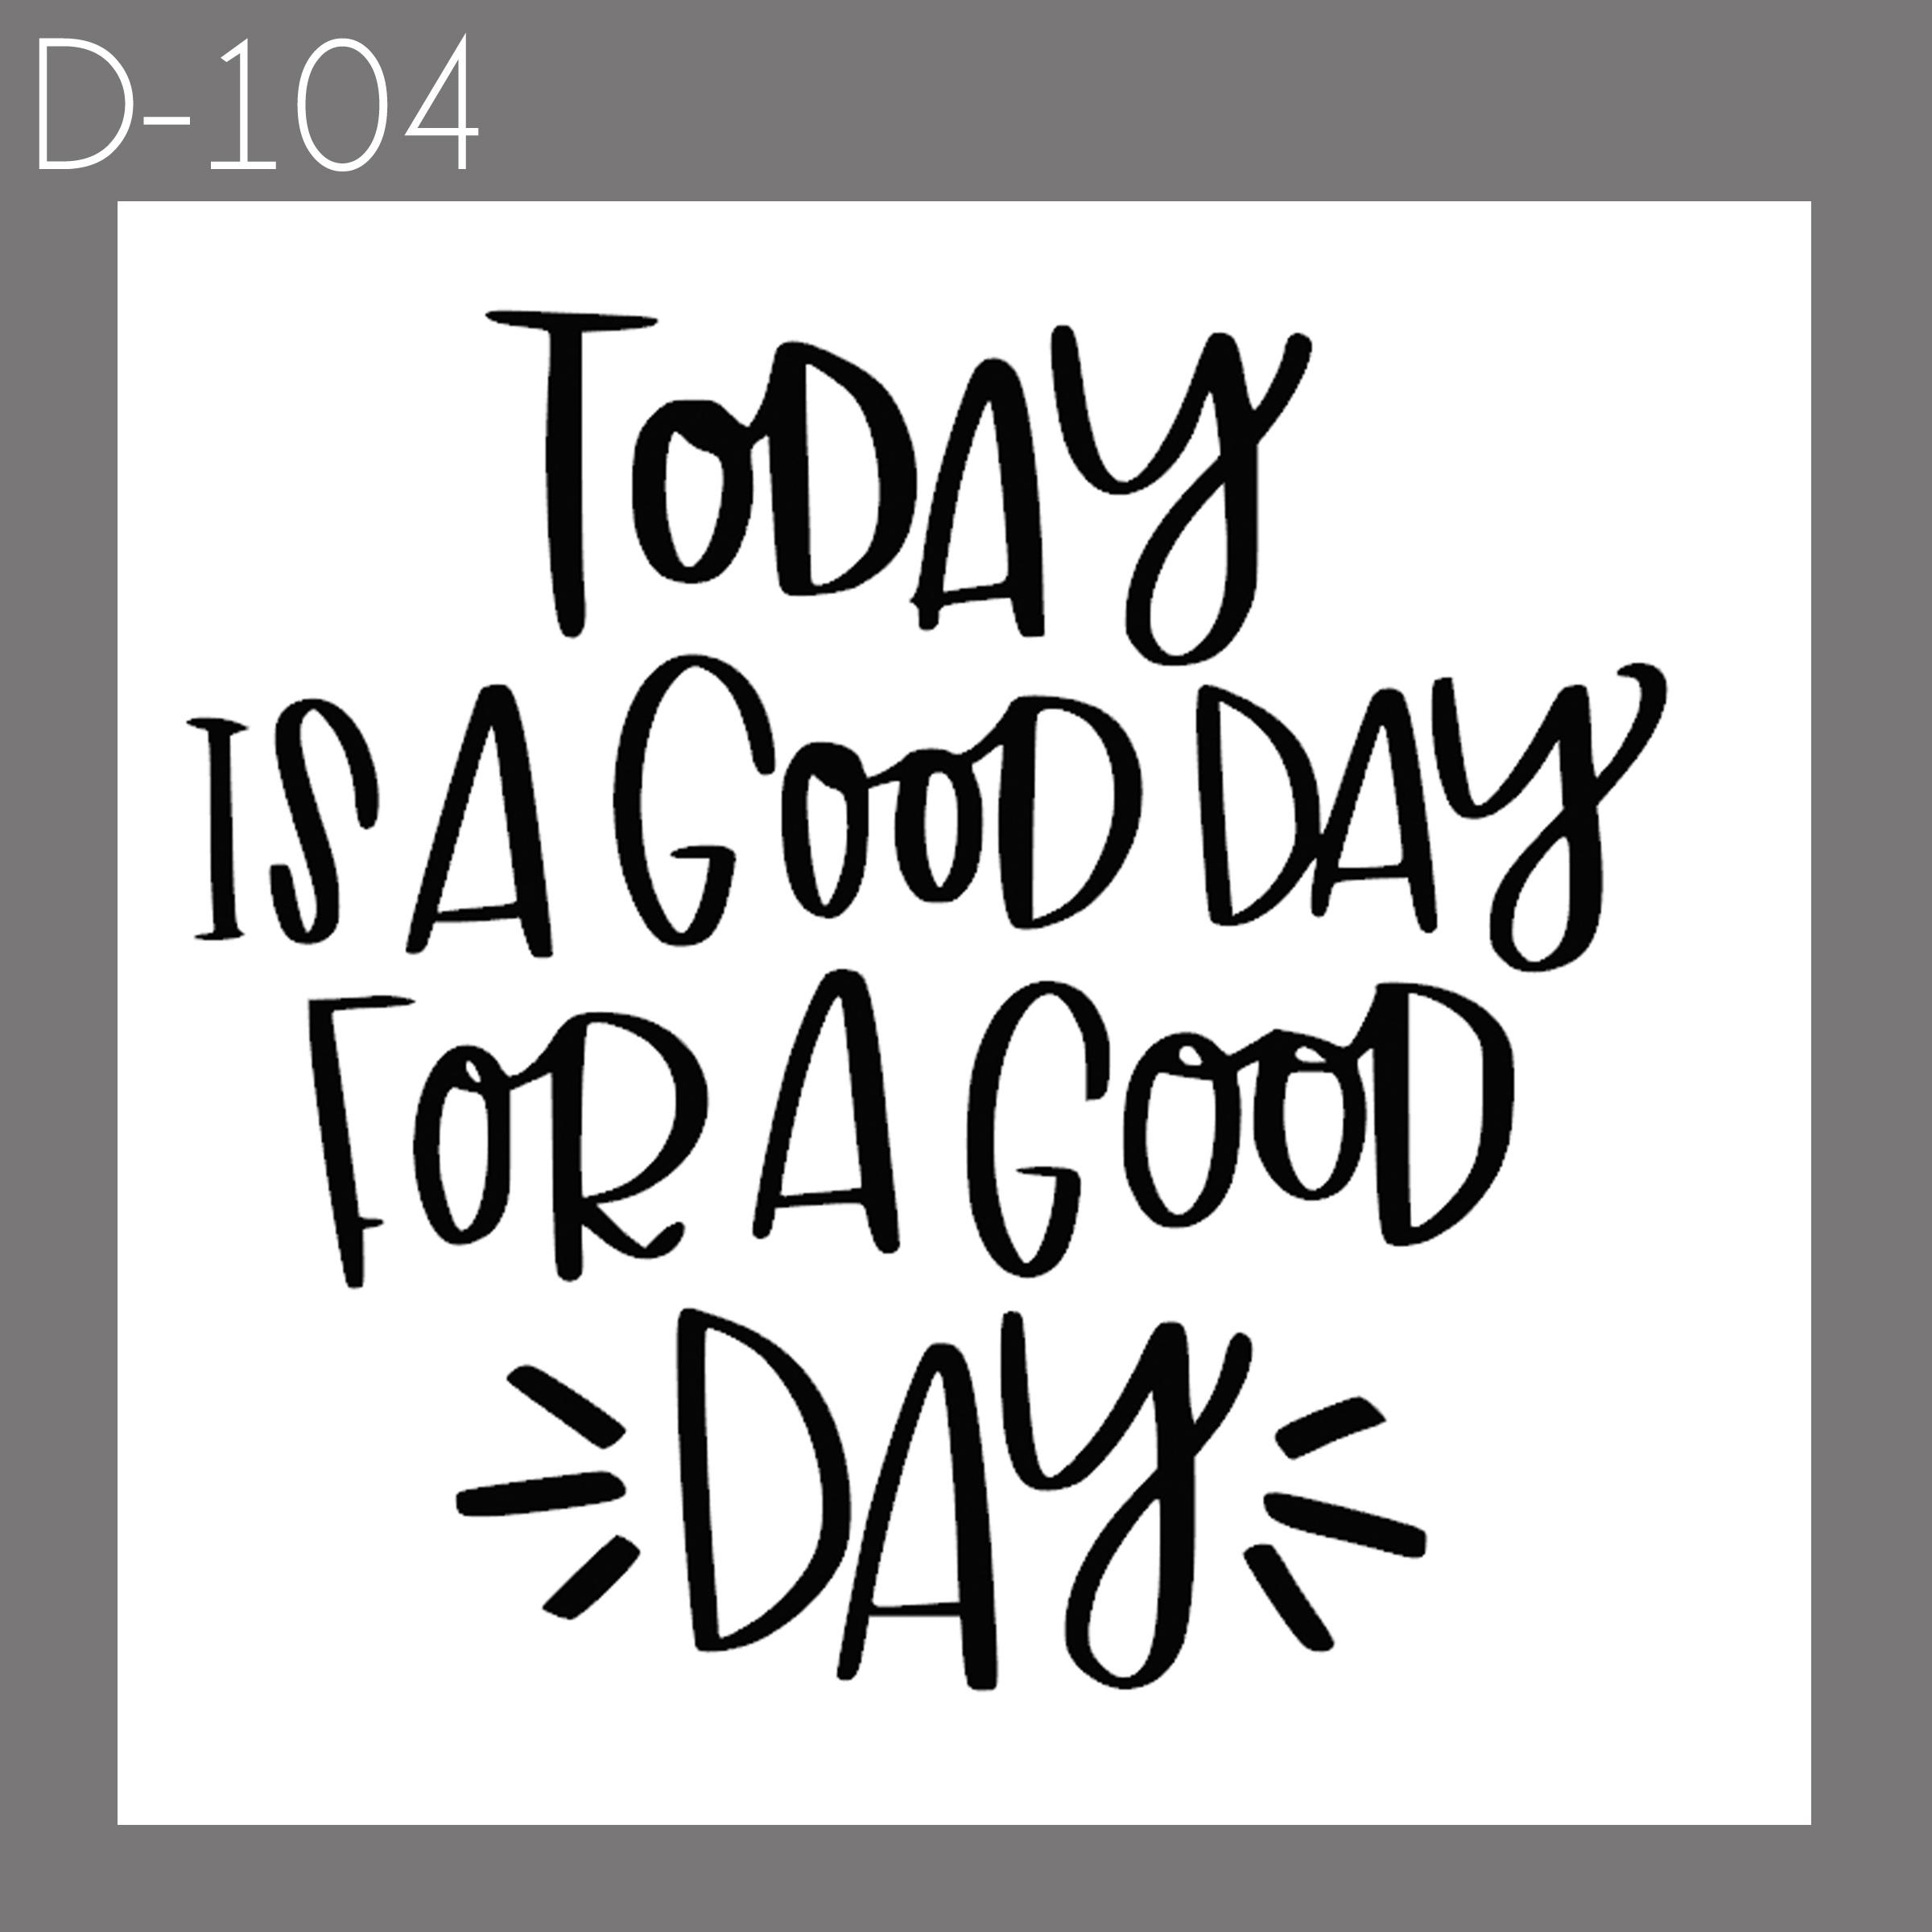 Good Day   $30